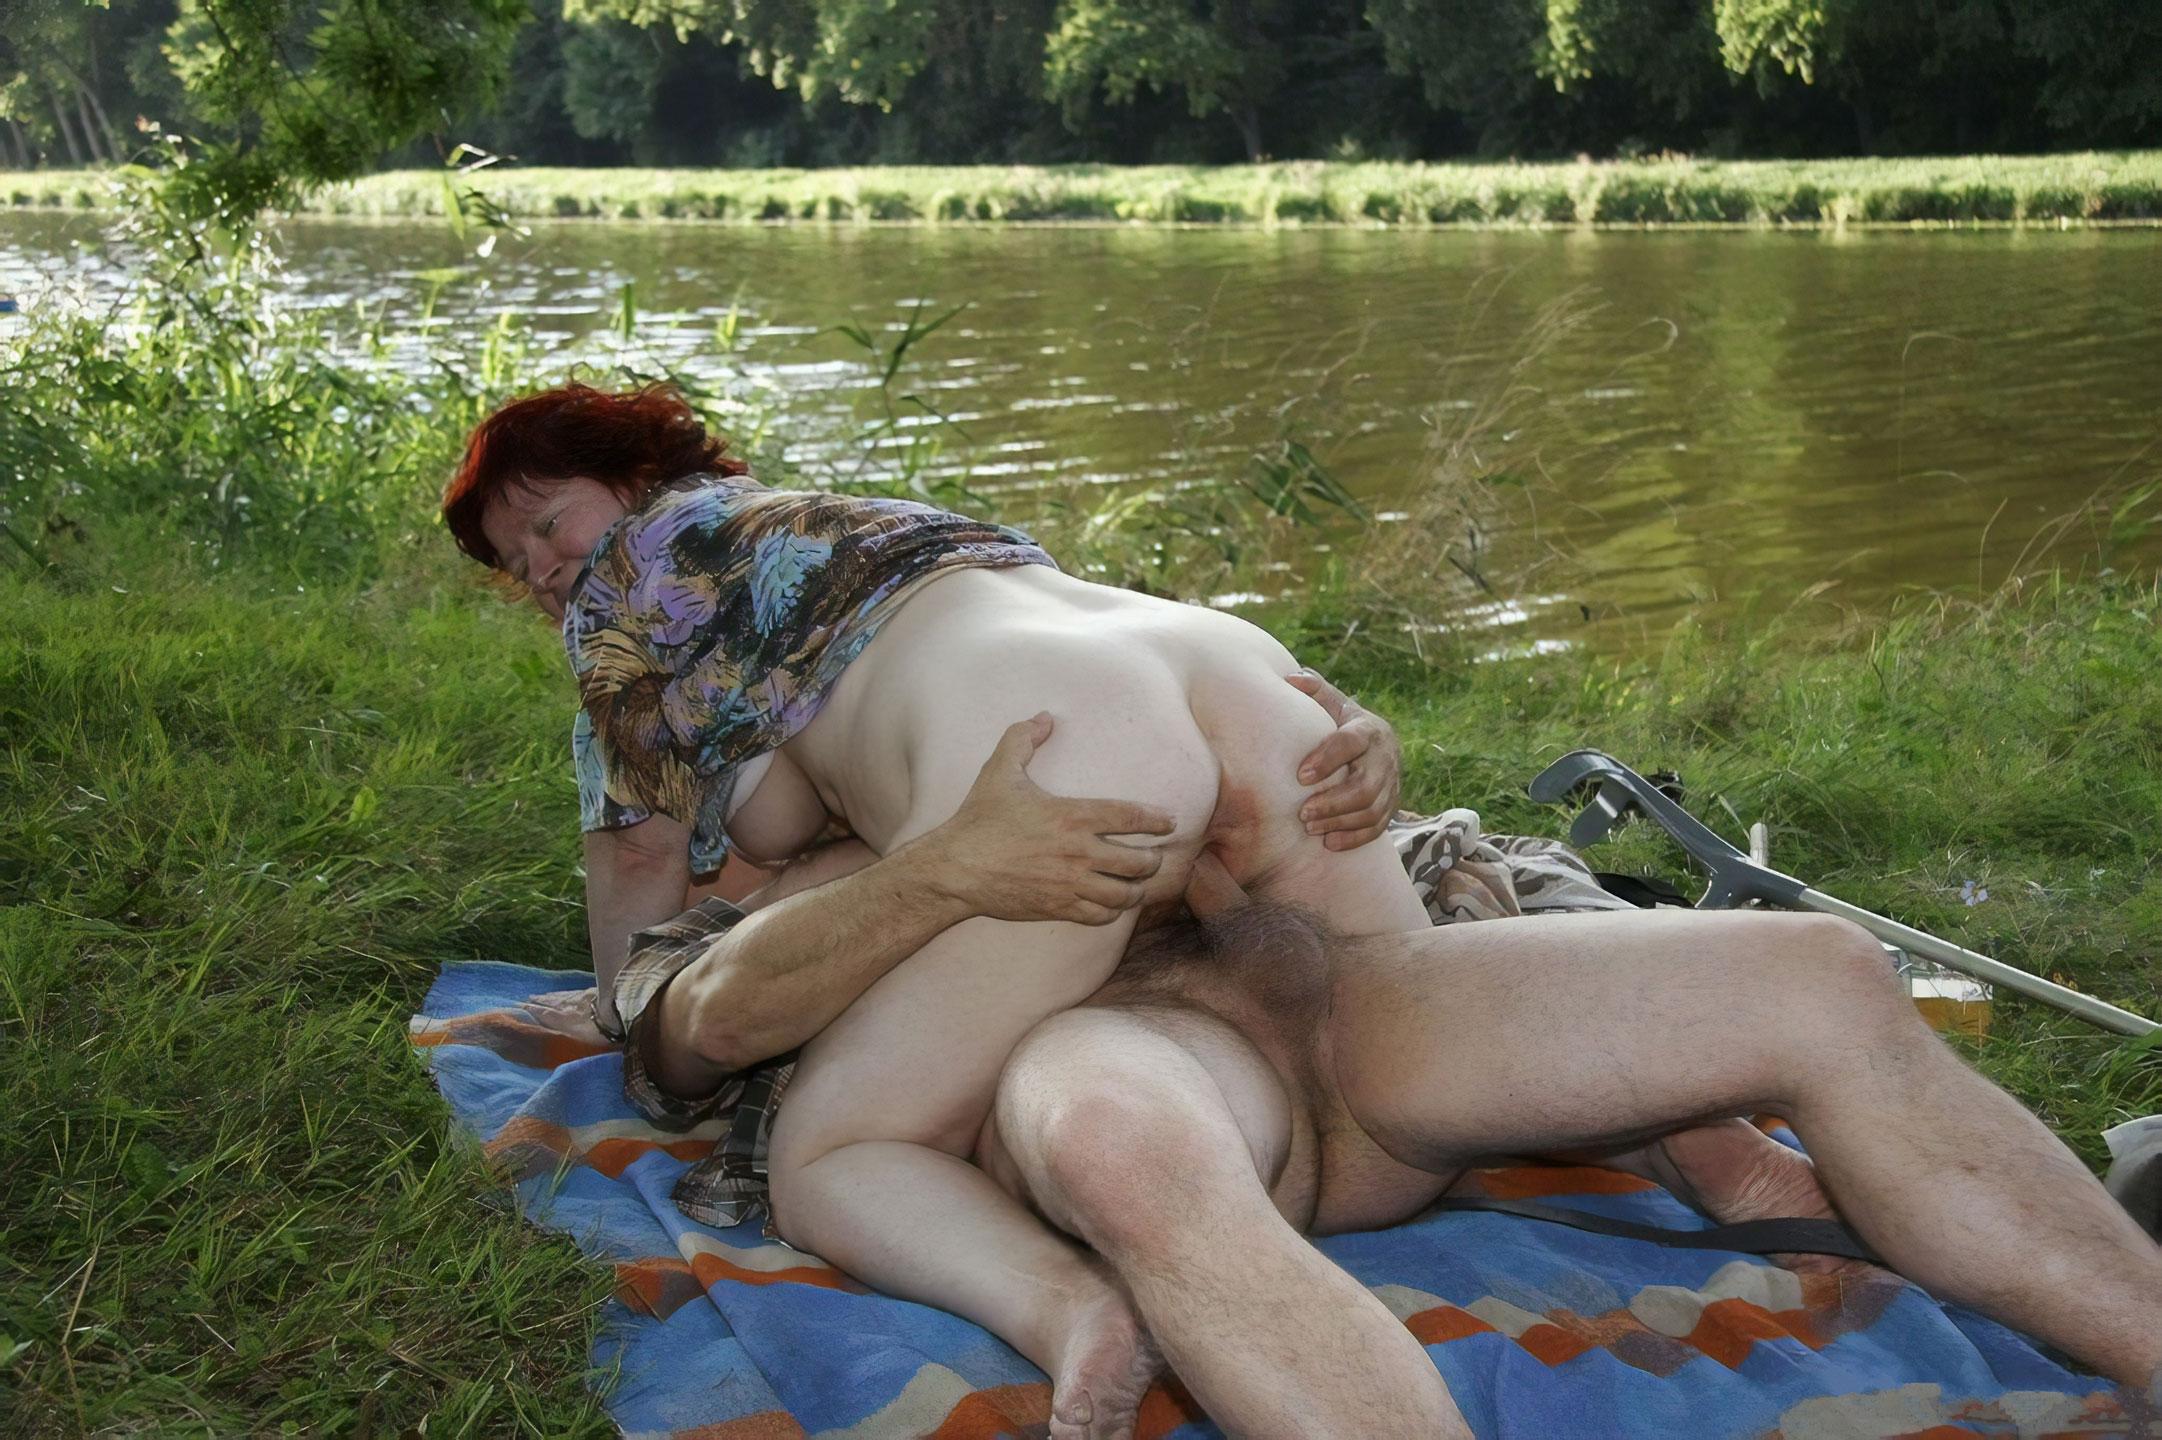 prosit-popu-erotika-zrelih-na-prirode-video-onlayn-aziatkami